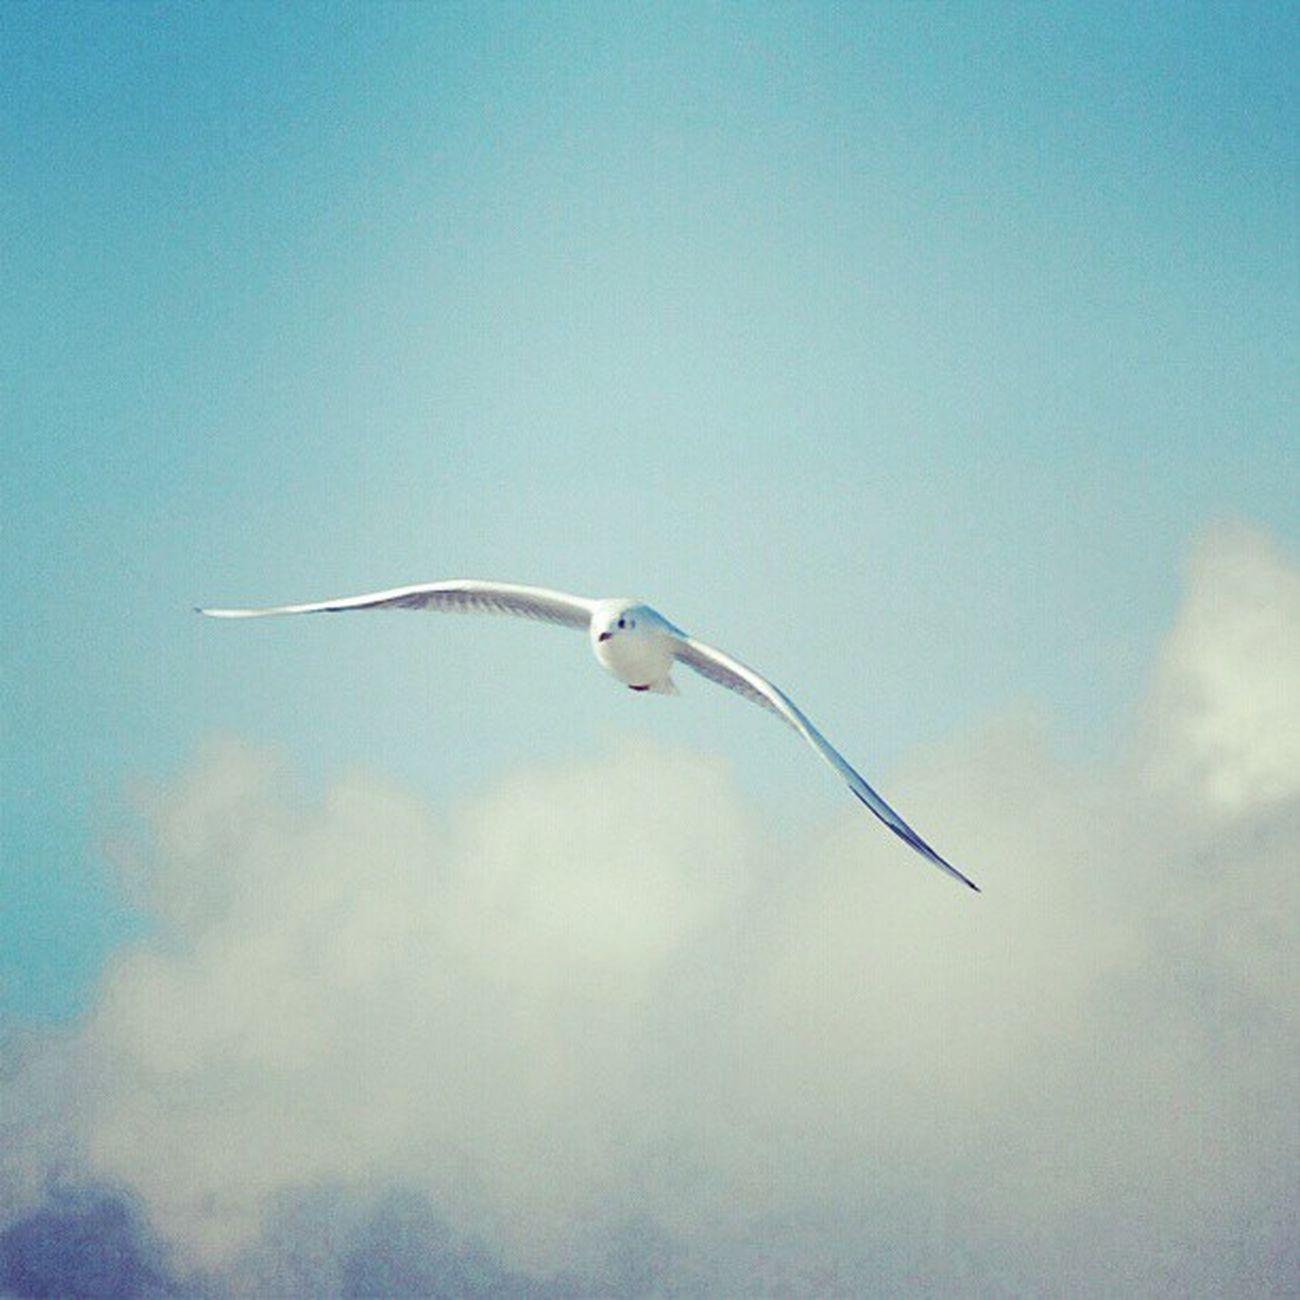 #hamburg #bird #fly #free #clouds Clouds Free Bird Fly Hamburg Igers Instagood Igfamos